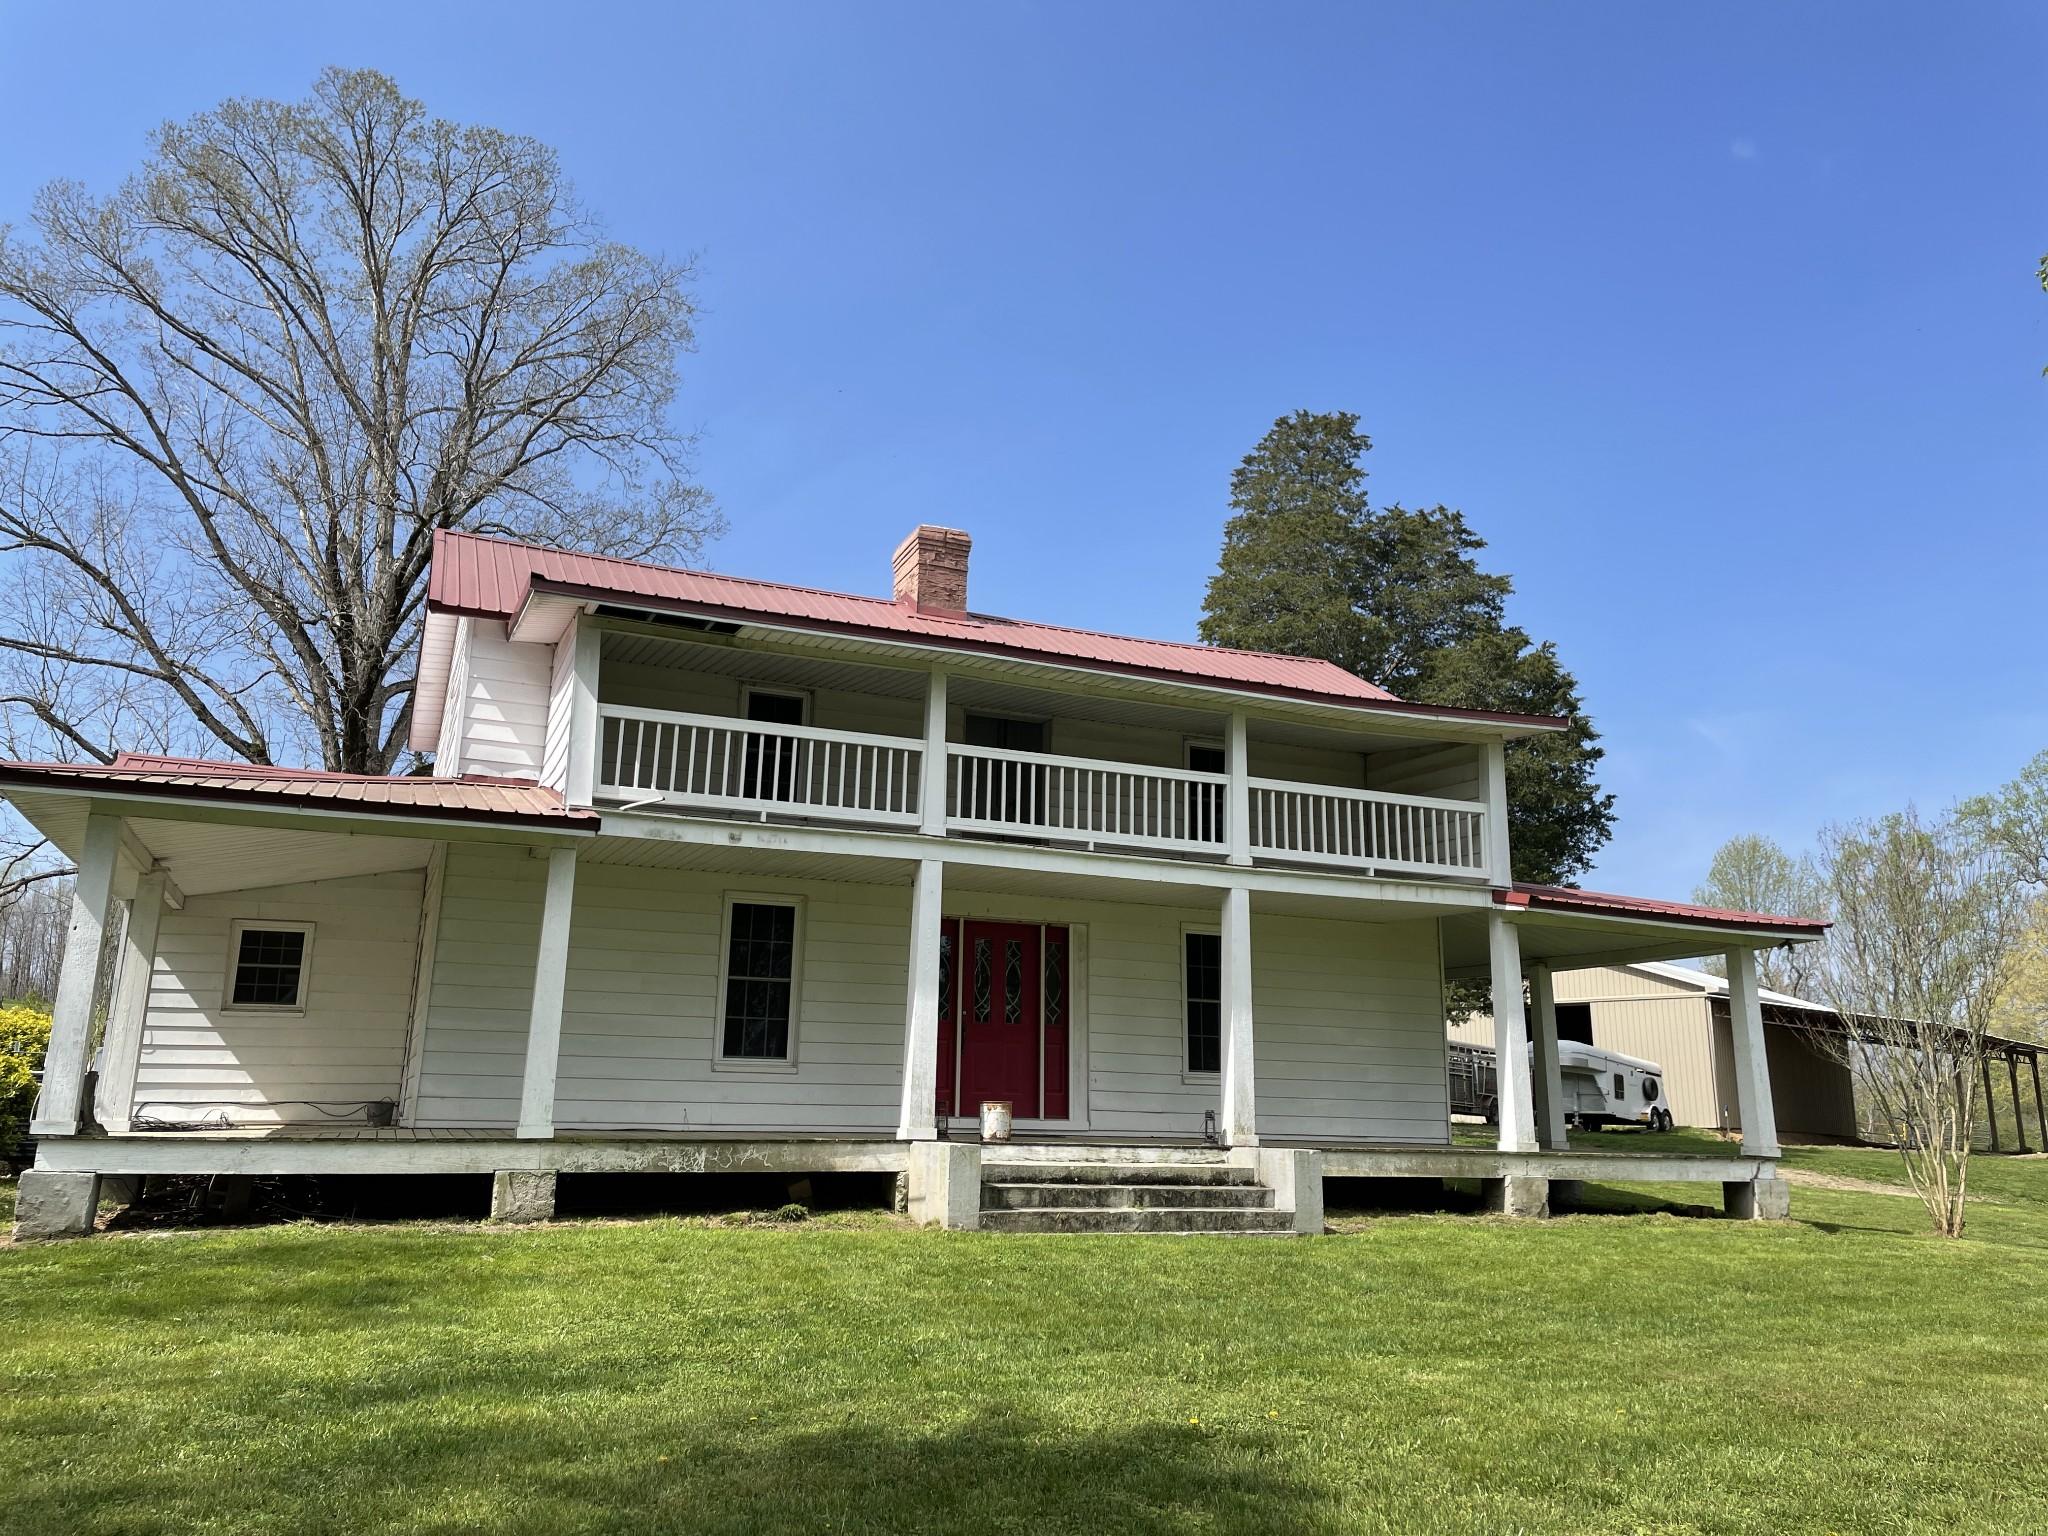 339 Henryville Rd Property Photo - Ethridge, TN real estate listing